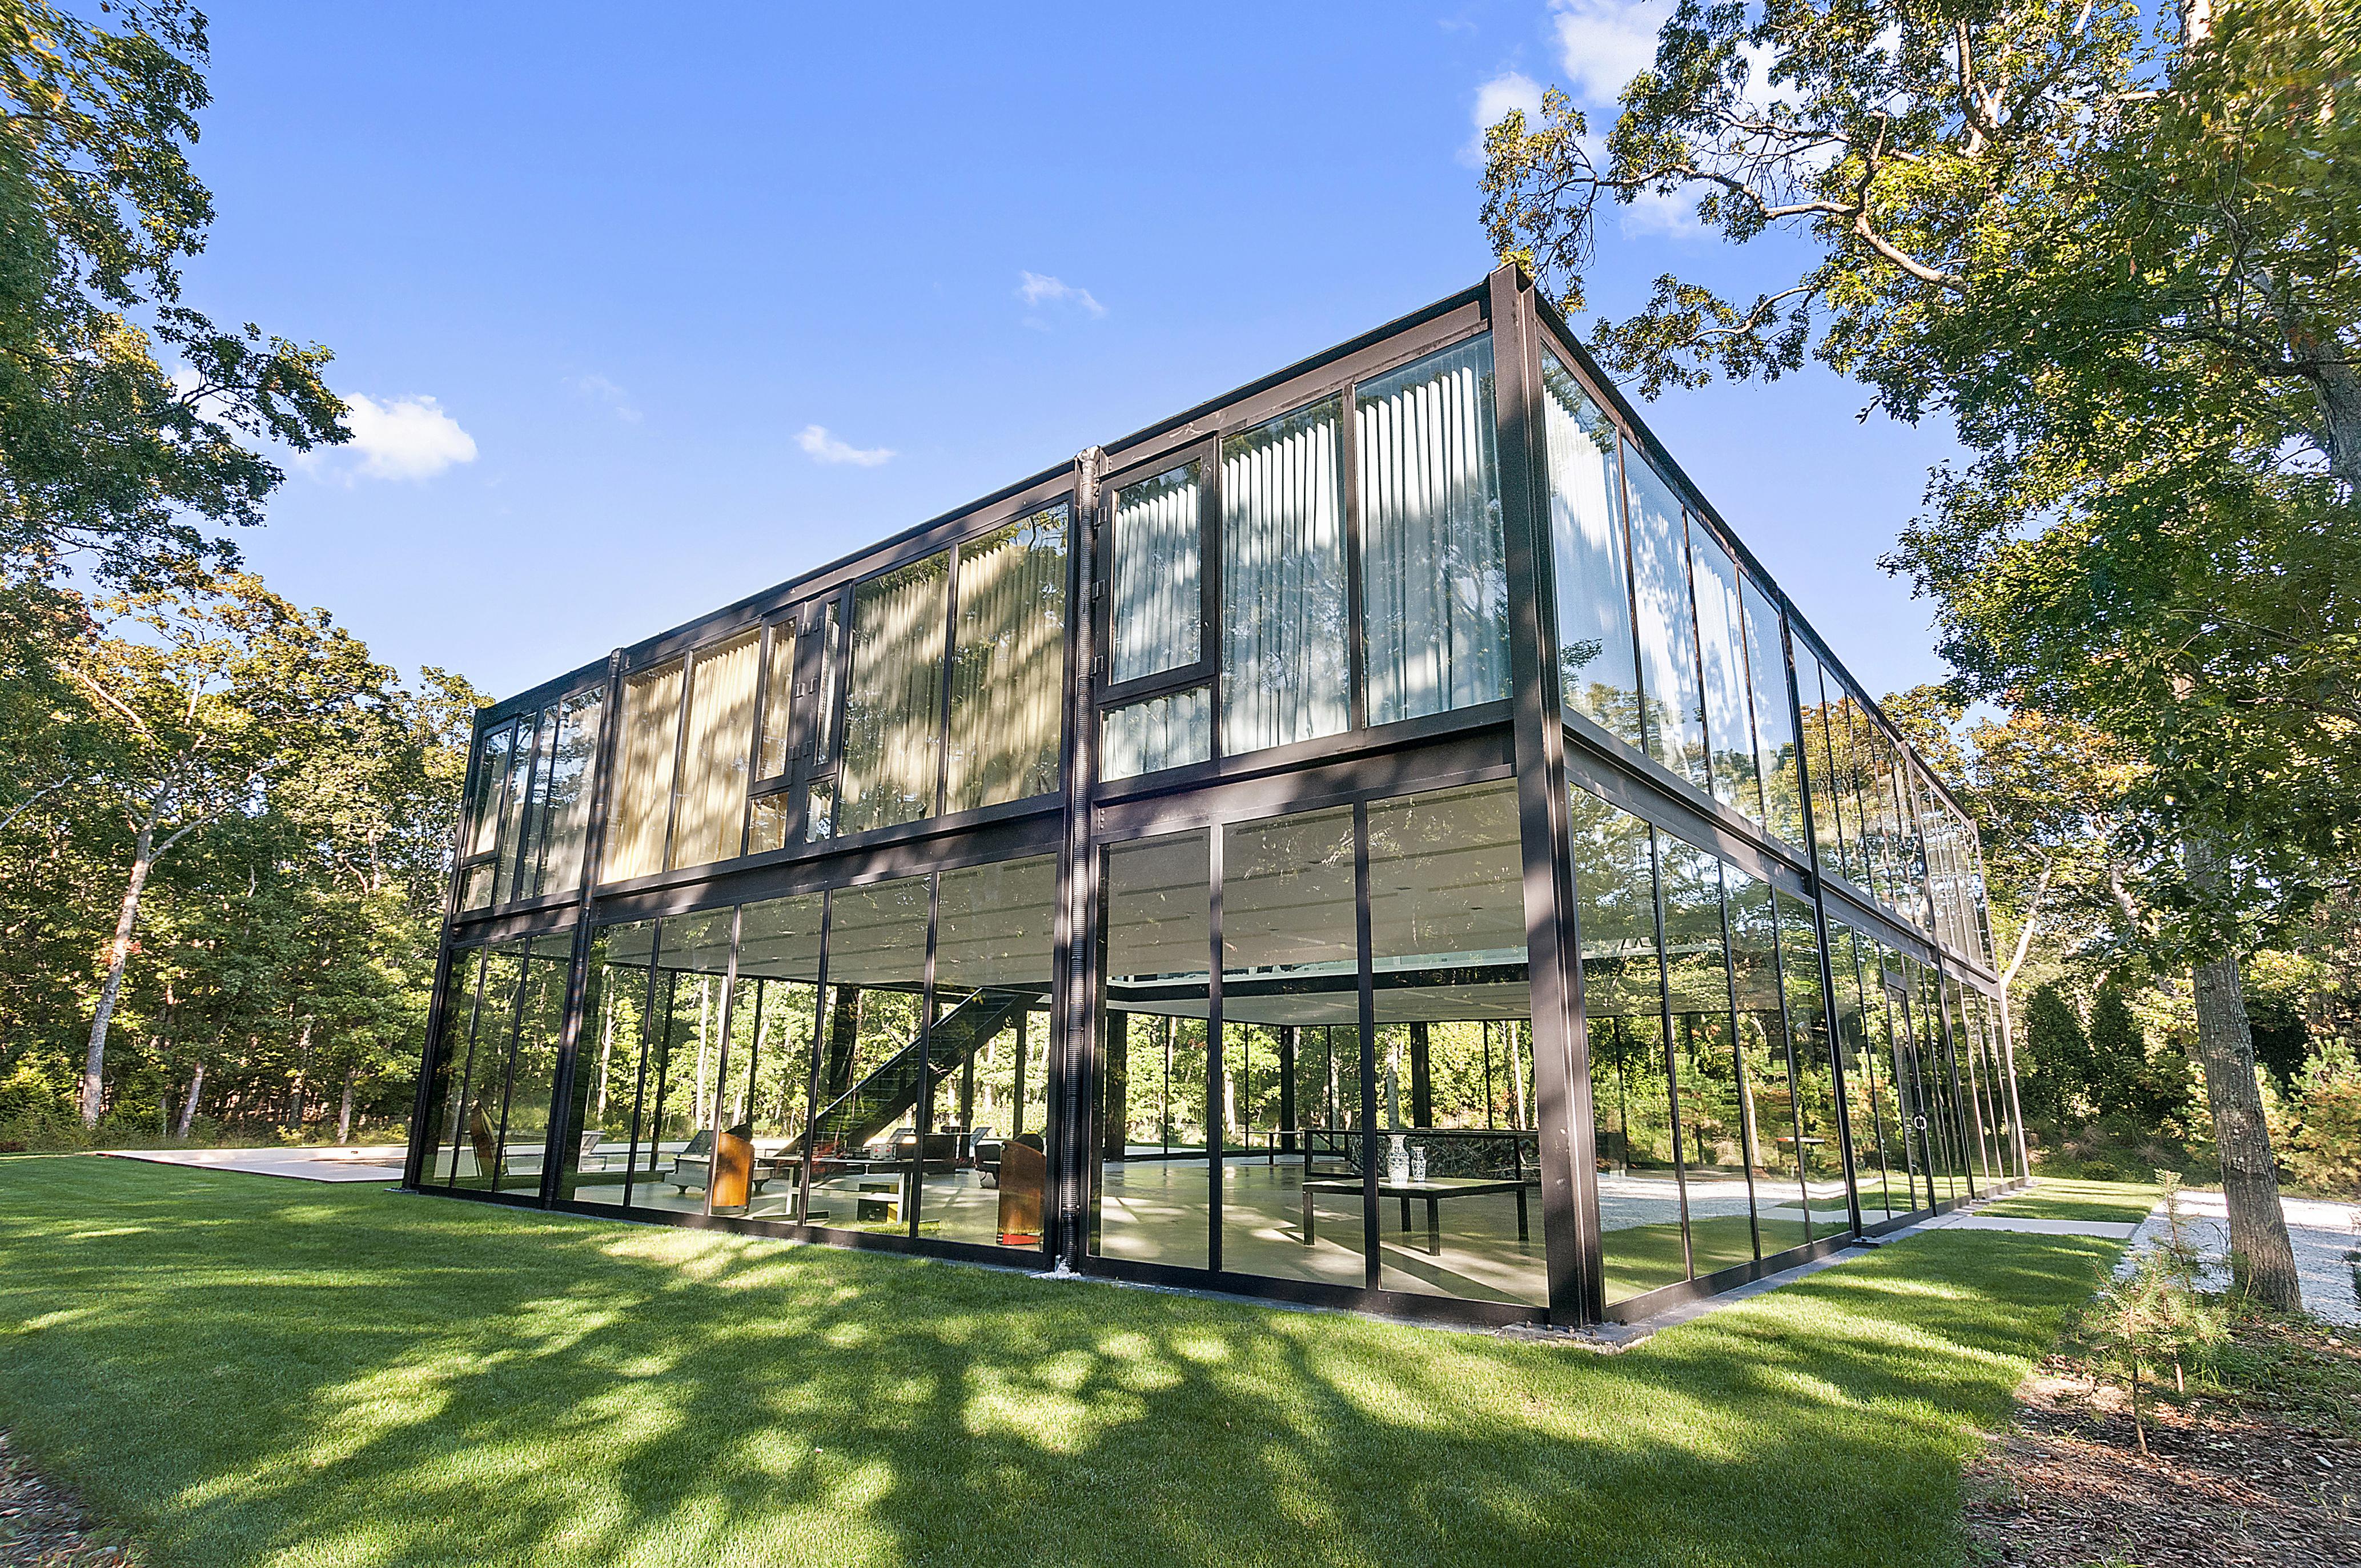 Industrial Bedrooms Sagaponack Abode Offers Multiple Views Of Ocean Pond And